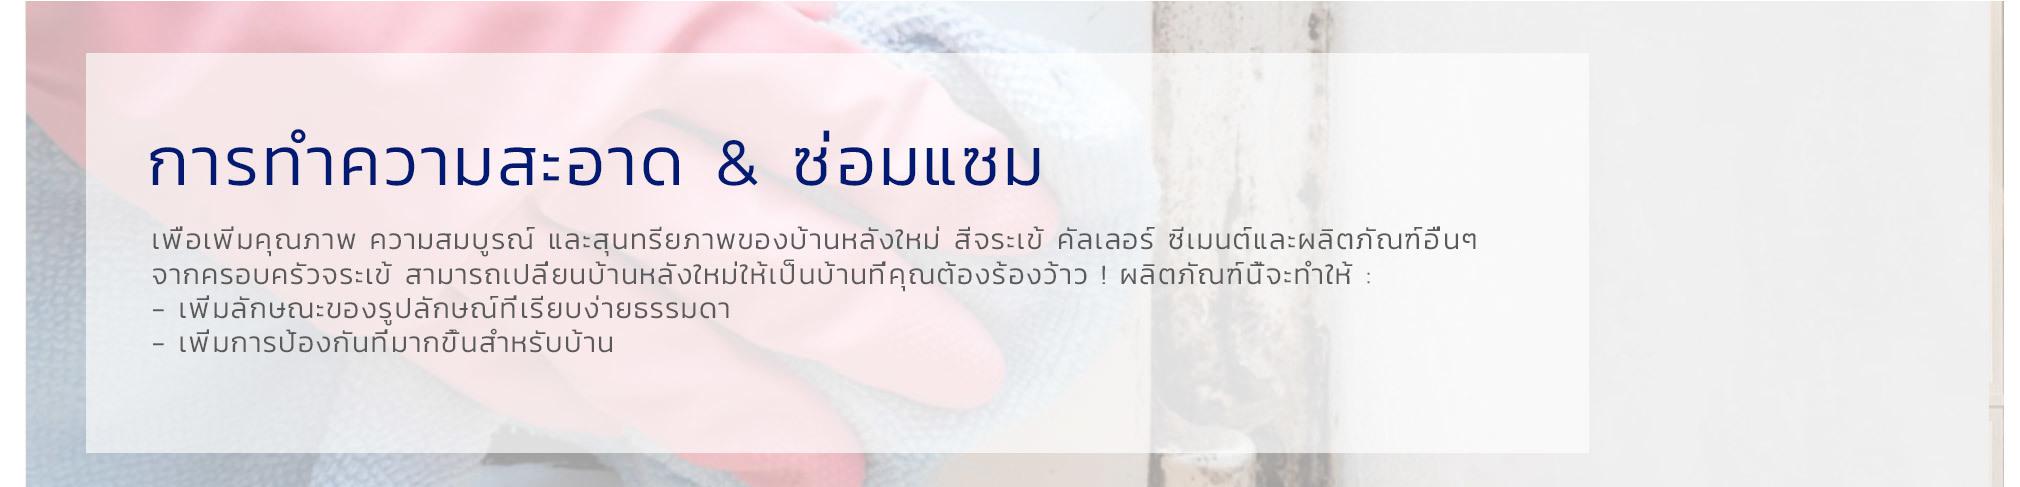 clean_newhome.jpg#asset:4875